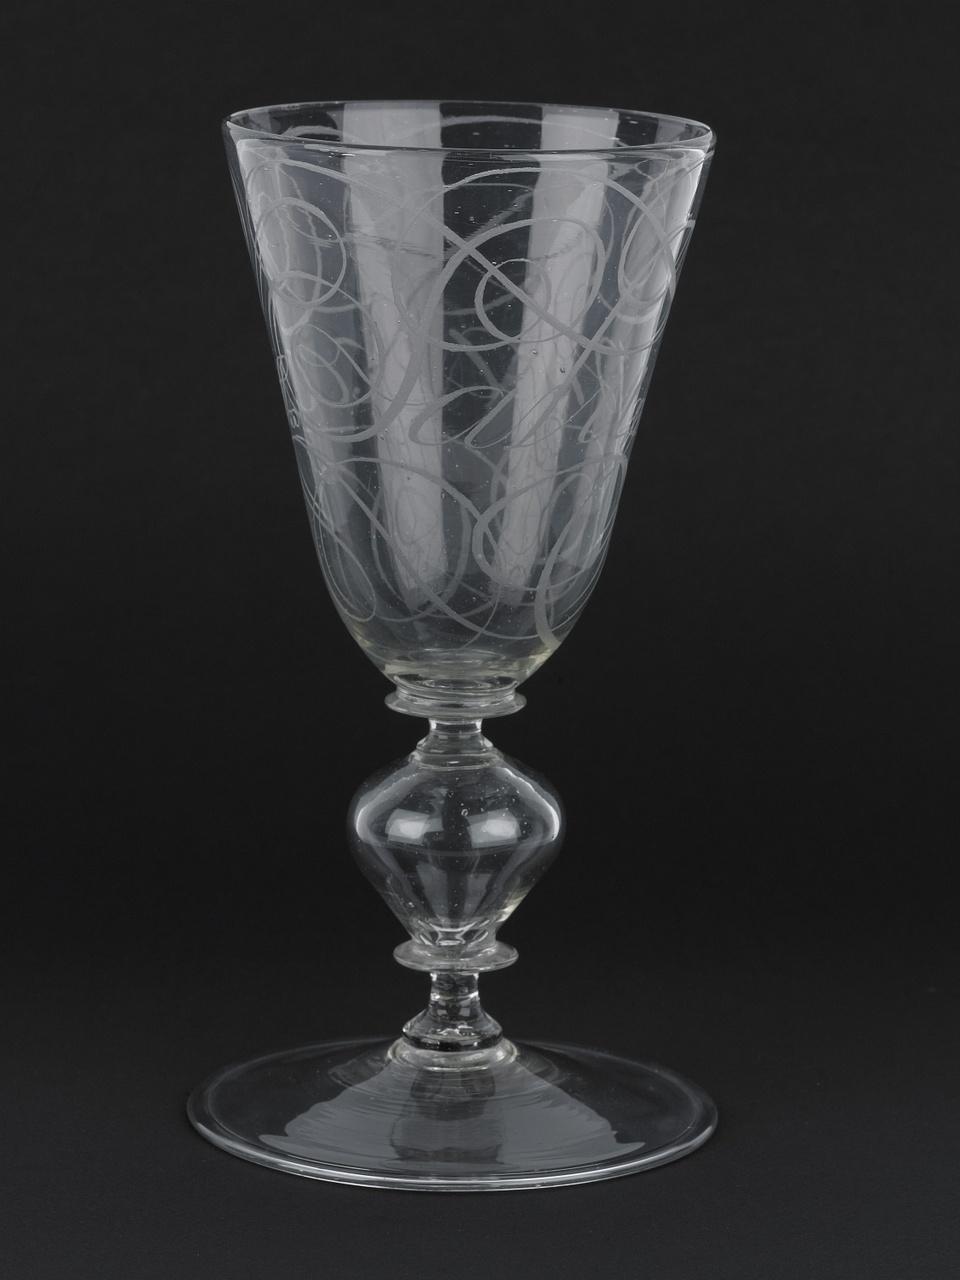 Kelkglas met diamantgravure, inscriptie: Salus praxeos [Heil van het succes], G. Panneel